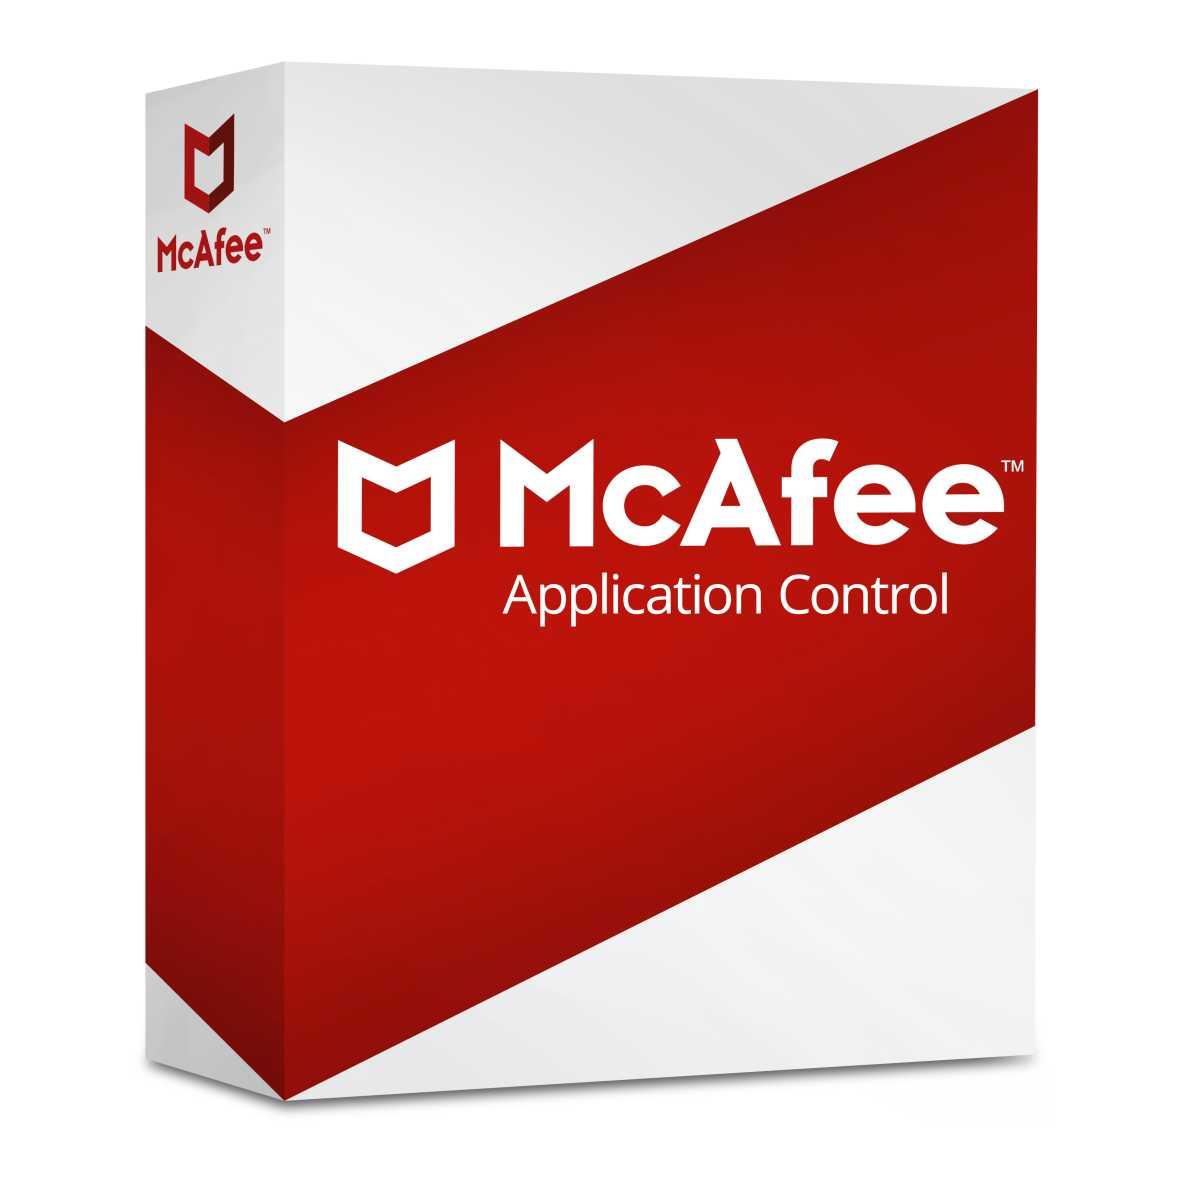 McAfee Application Control